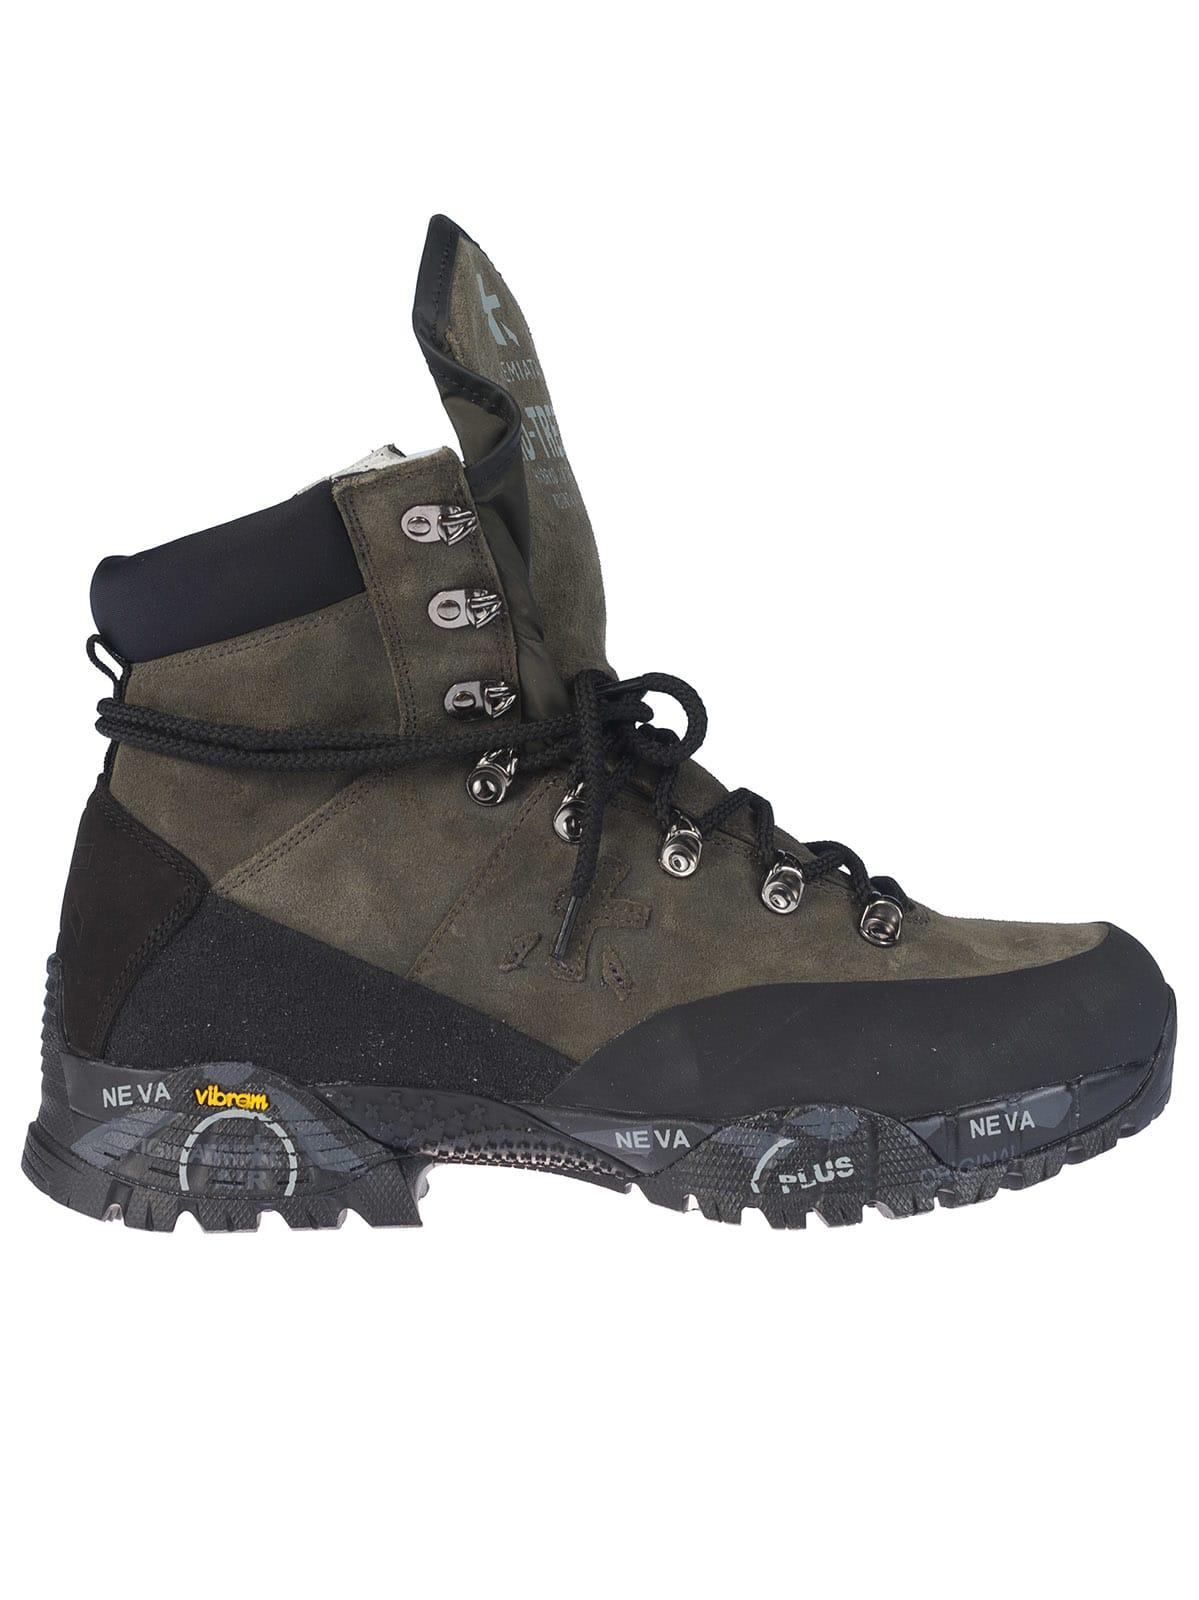 Premiata Midtreck Lace-up Boots